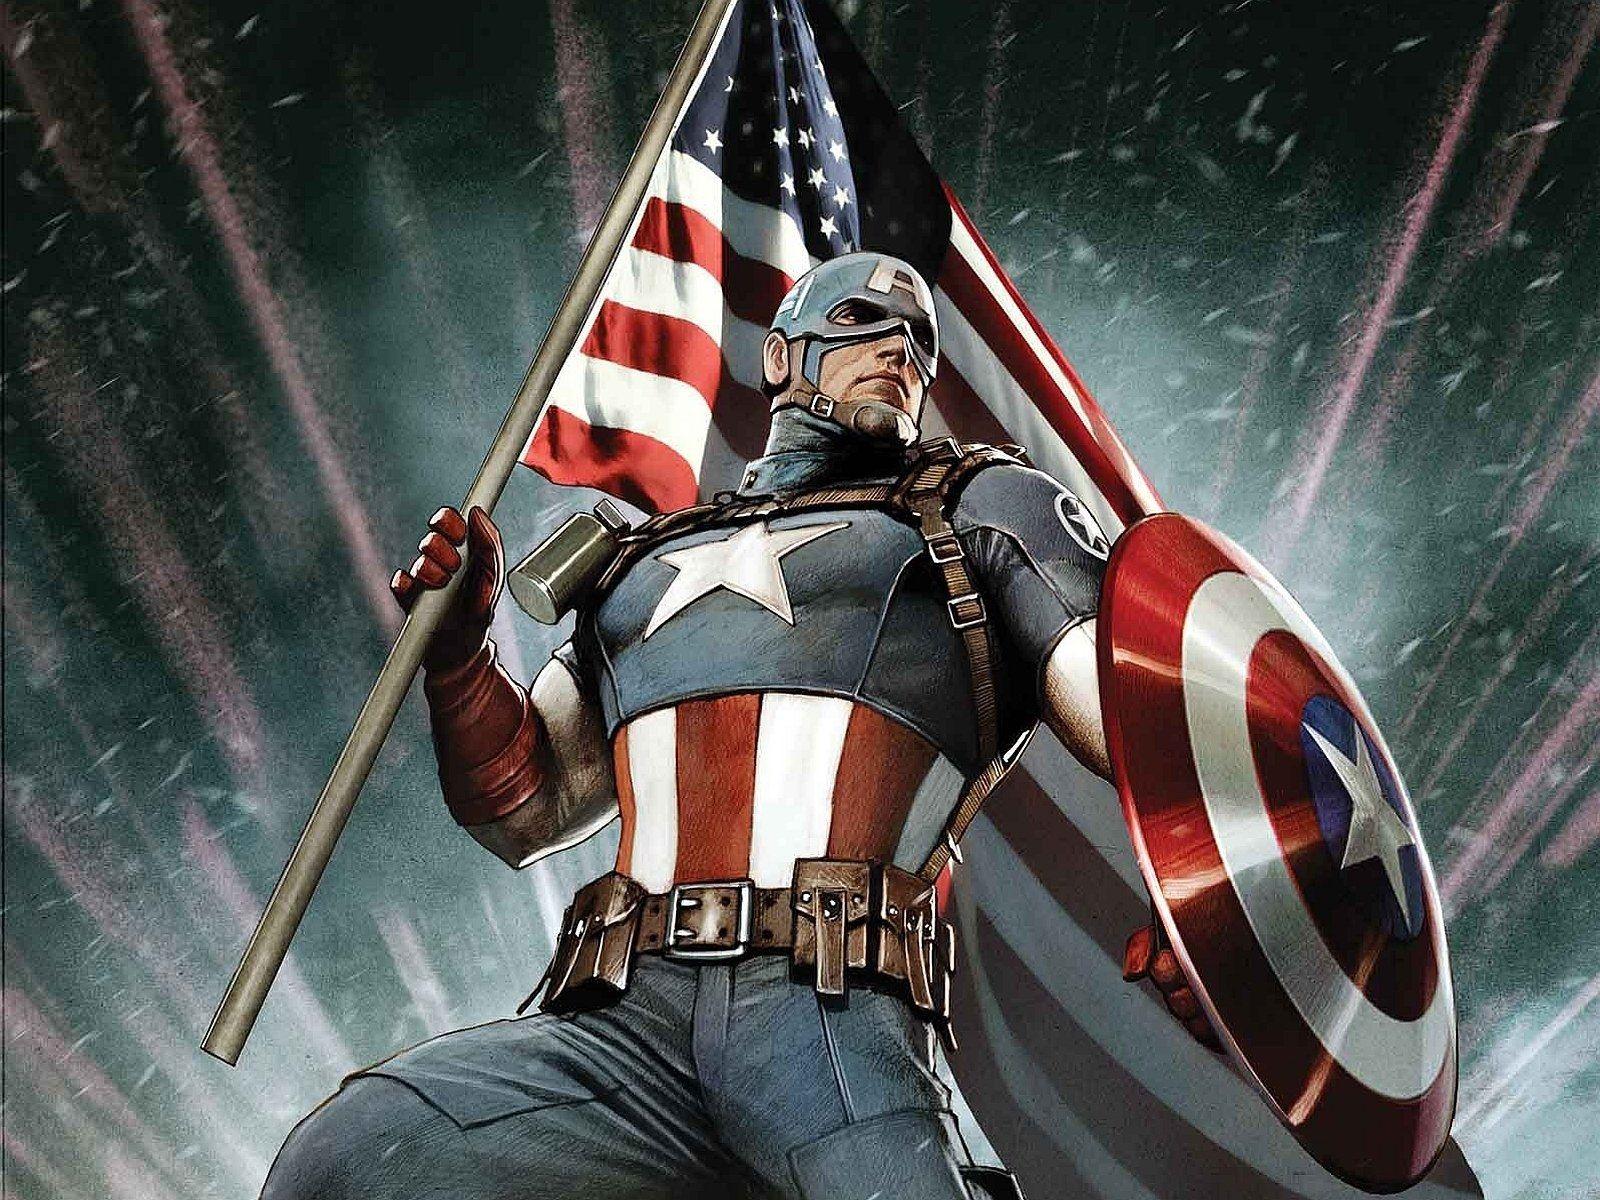 Captain America 4K Wallpapers Wallpaper Download - High ...